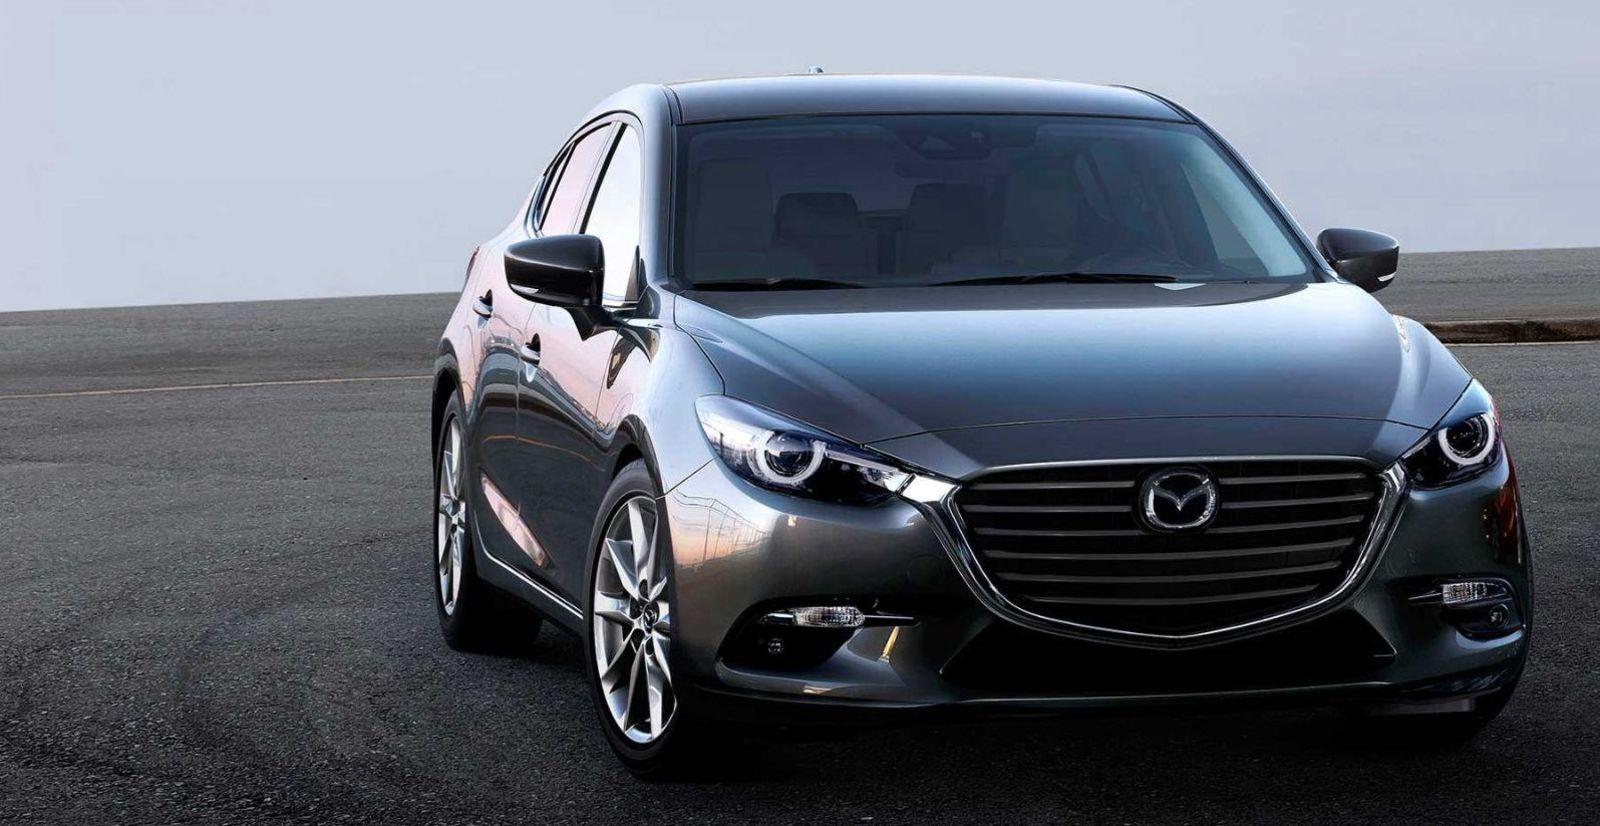 Mazda 3 Service Manual: Entertainment System